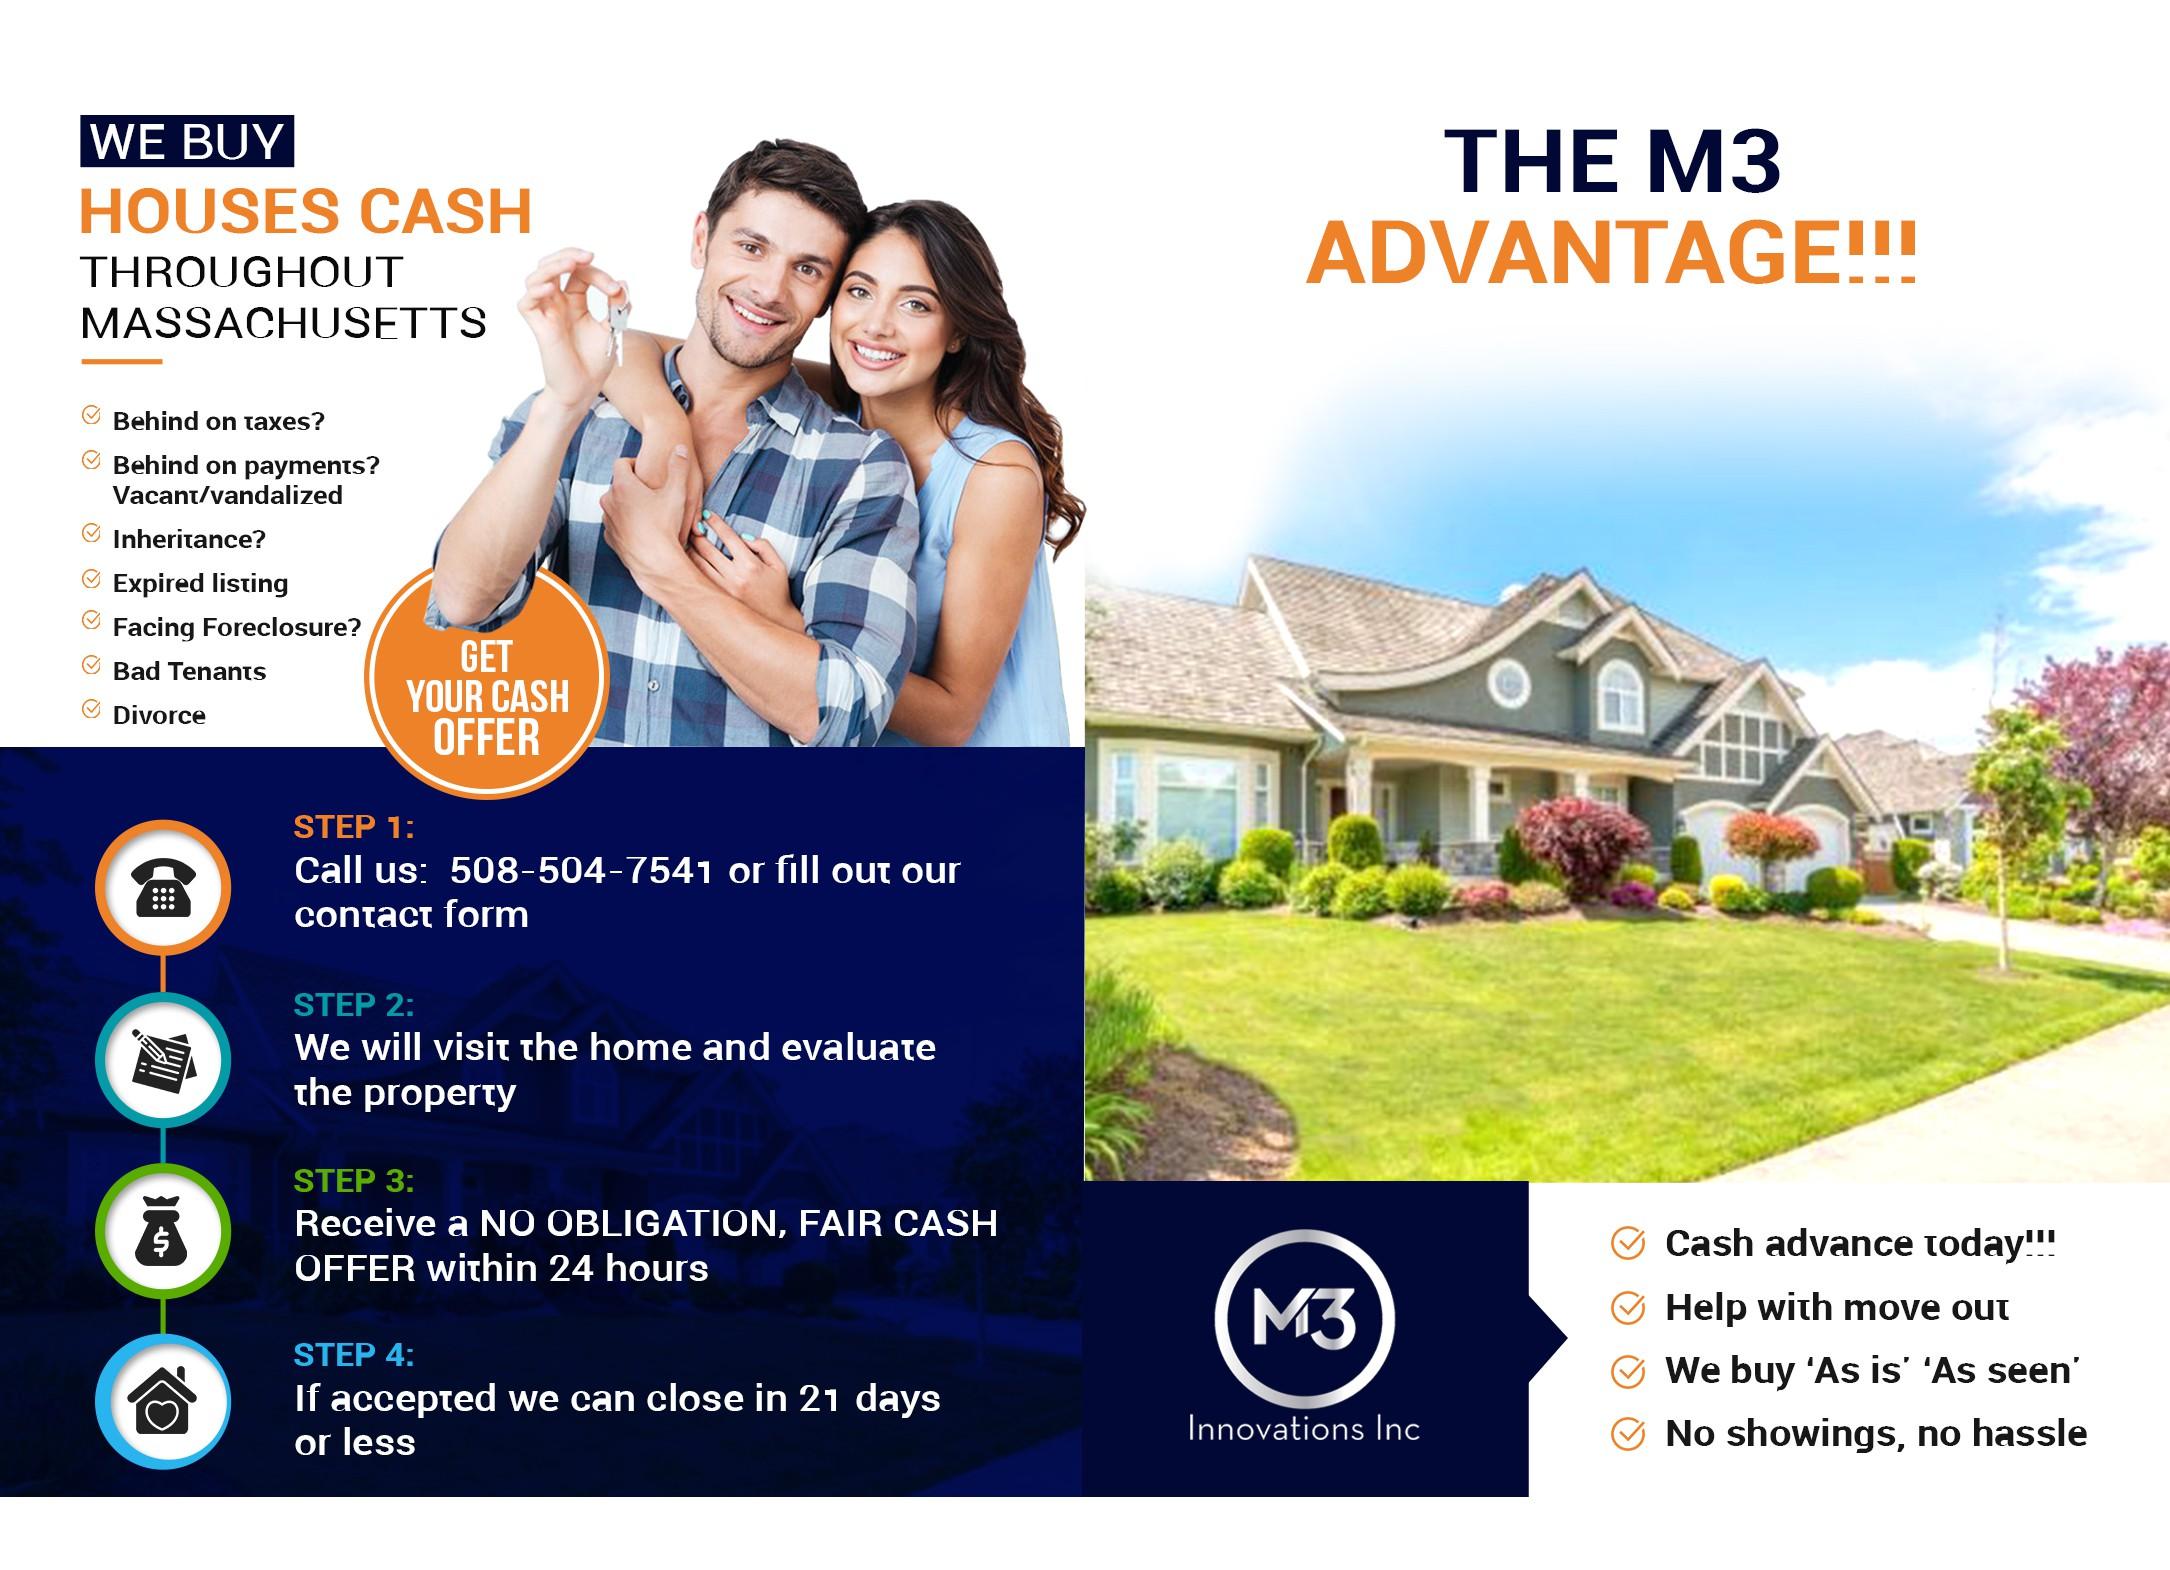 M3 Innovations, Inc - Marketing Pamphlet